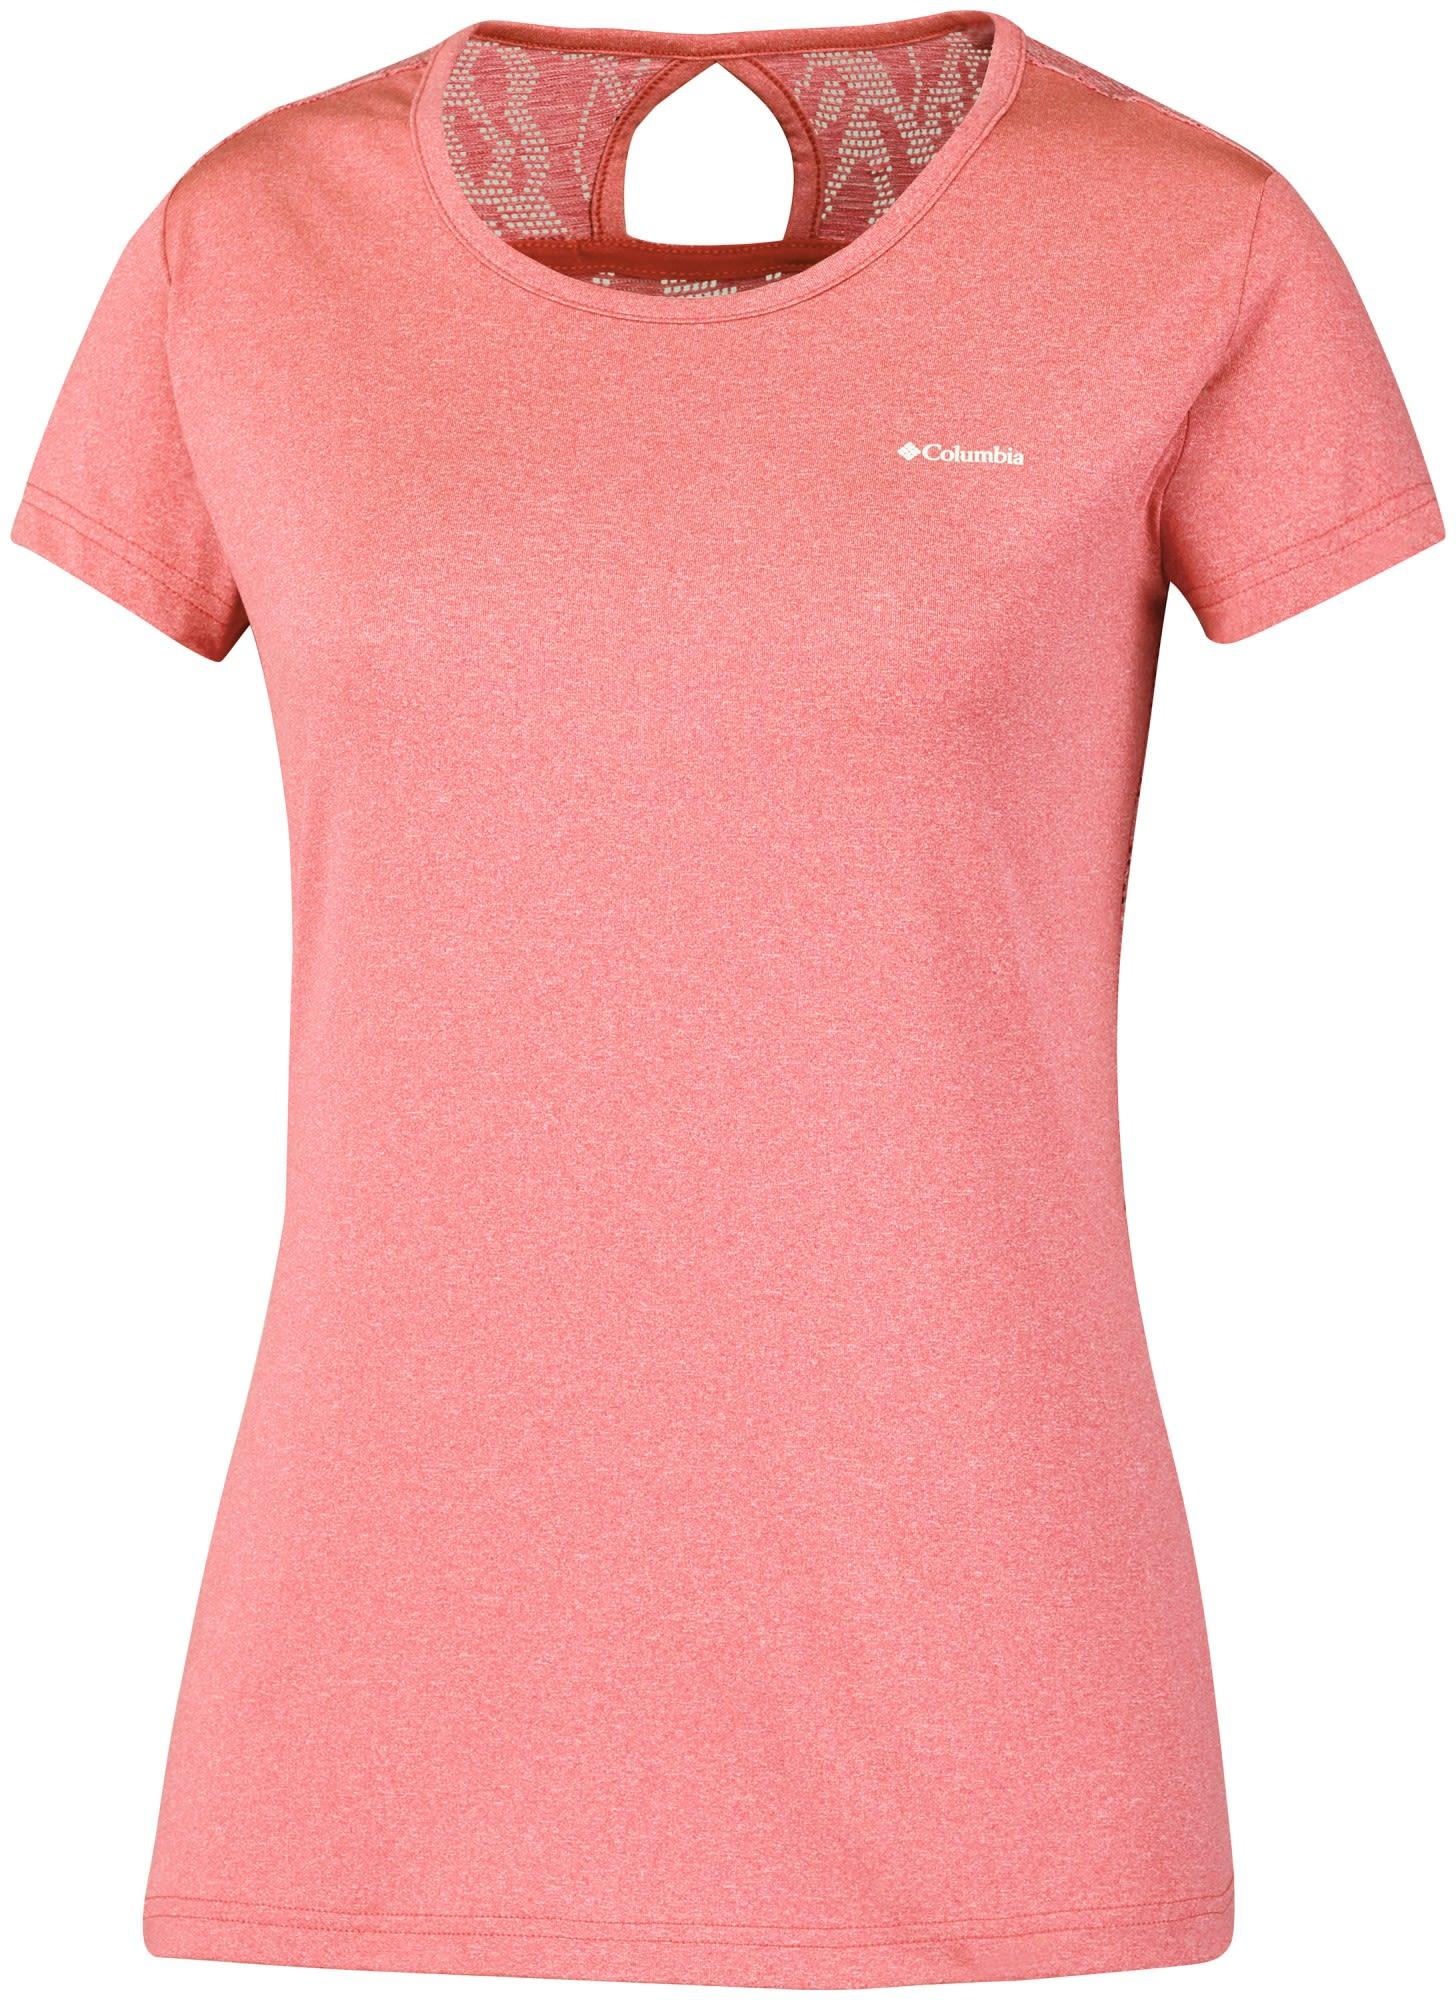 Columbia Peak TO Point Novelty Short Sleeve Shirt Rot, Female Kurzarm-Shirt, M